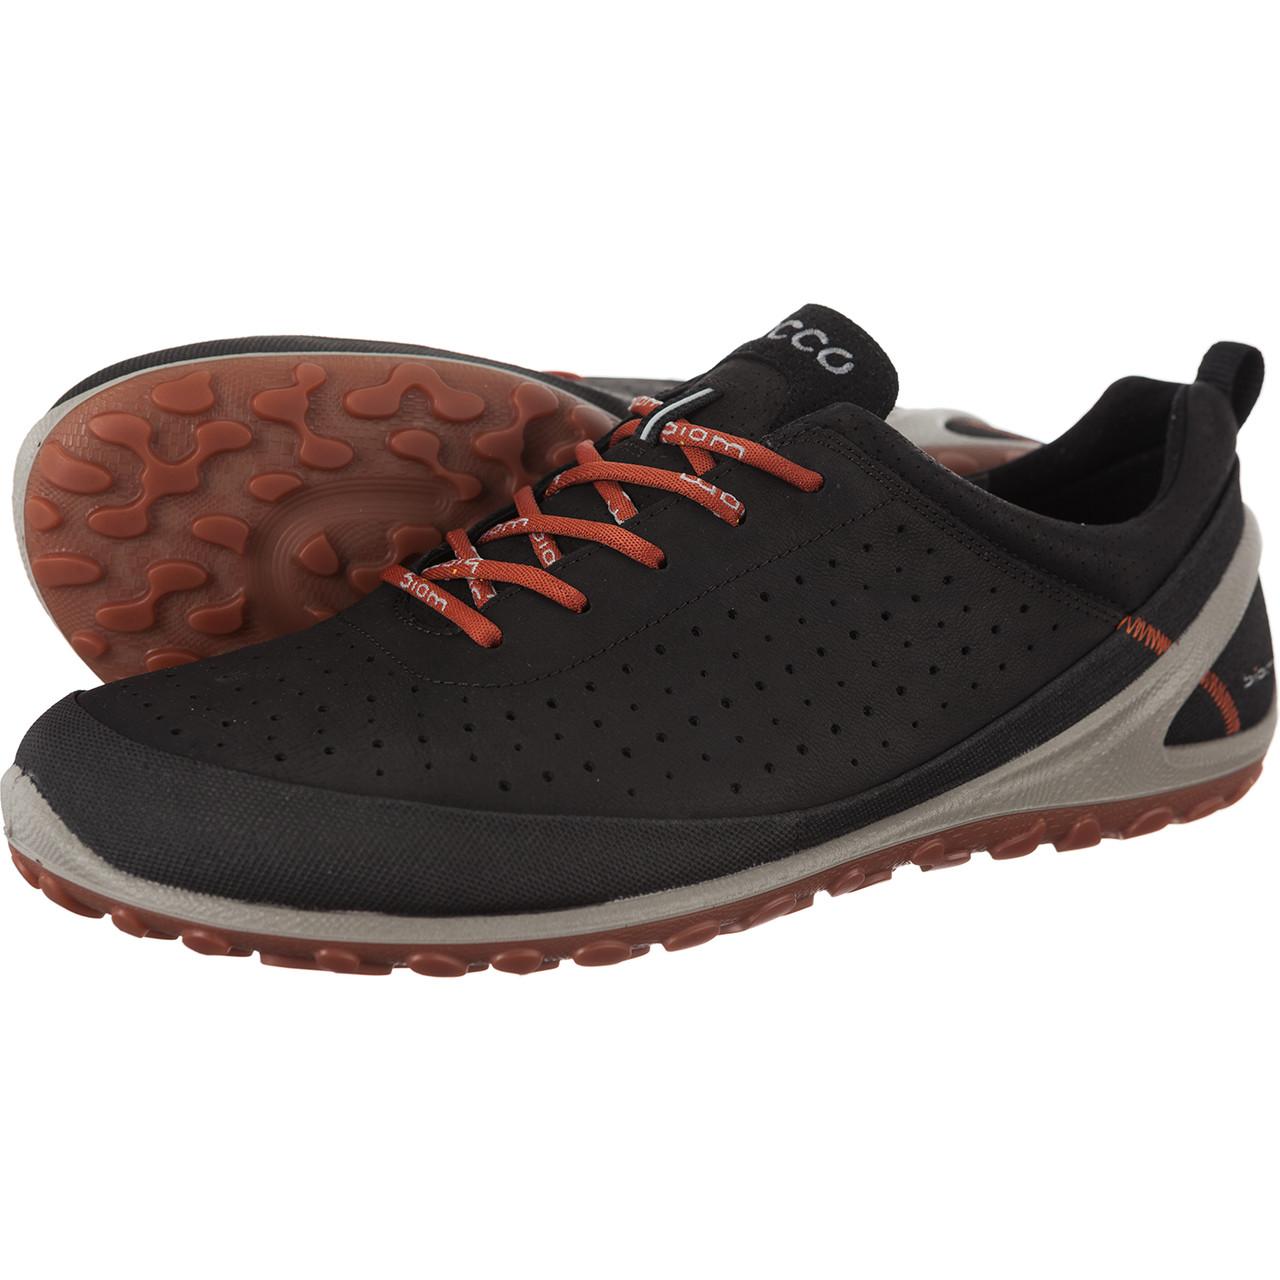 cc1c9f10 ecco promocje buty nowe